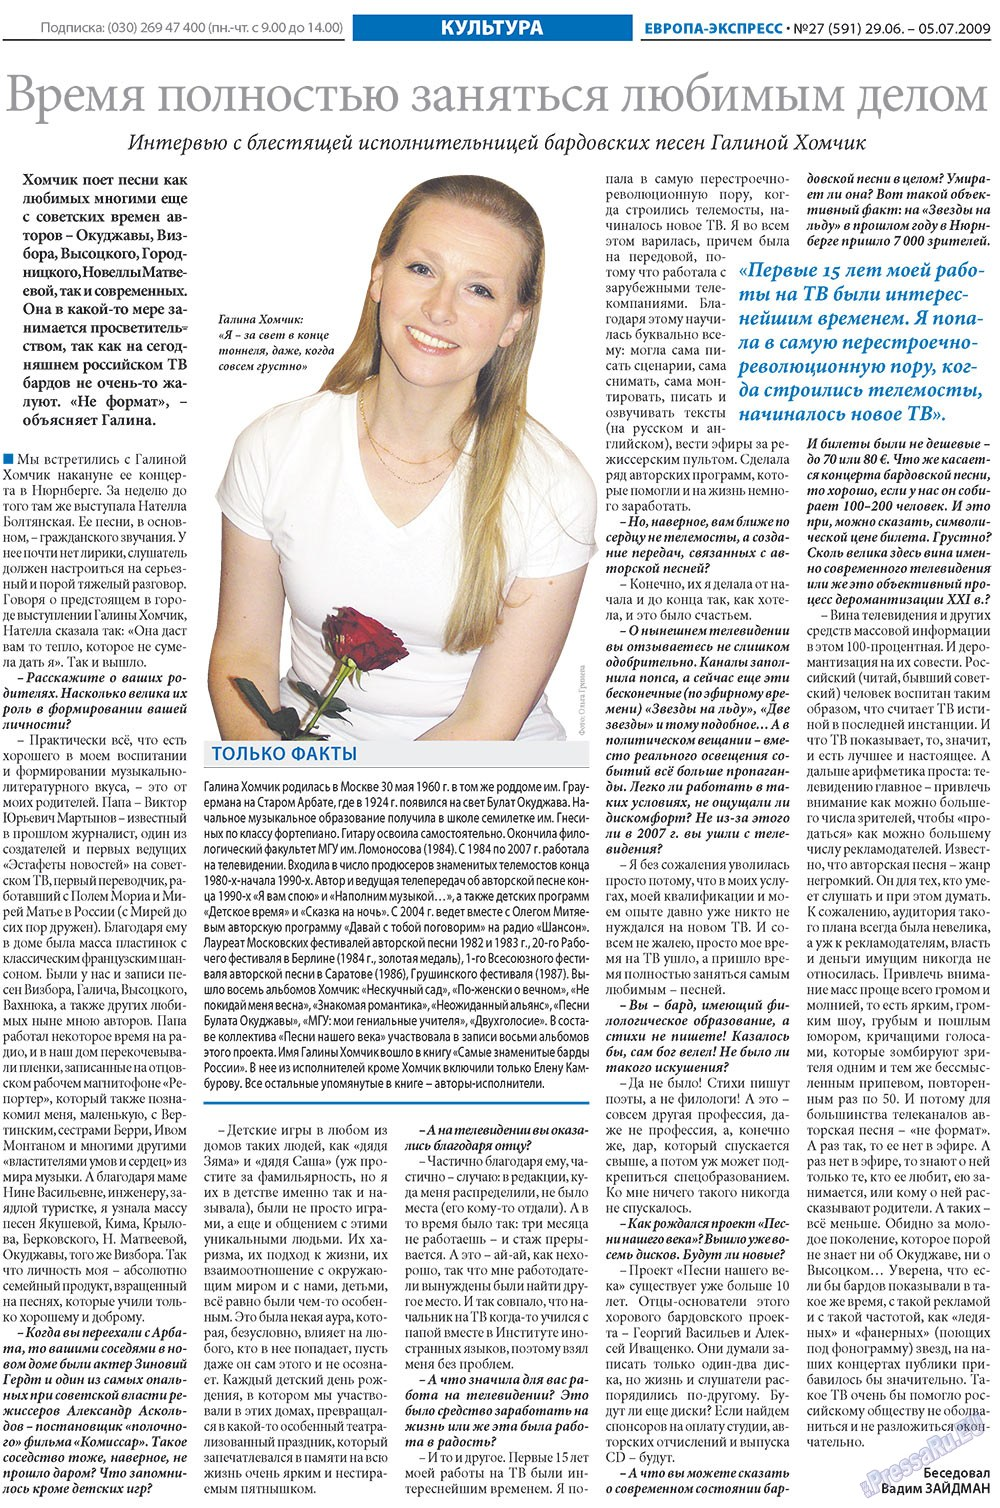 Европа экспресс (газета). 2009 год, номер 27, стр. 20